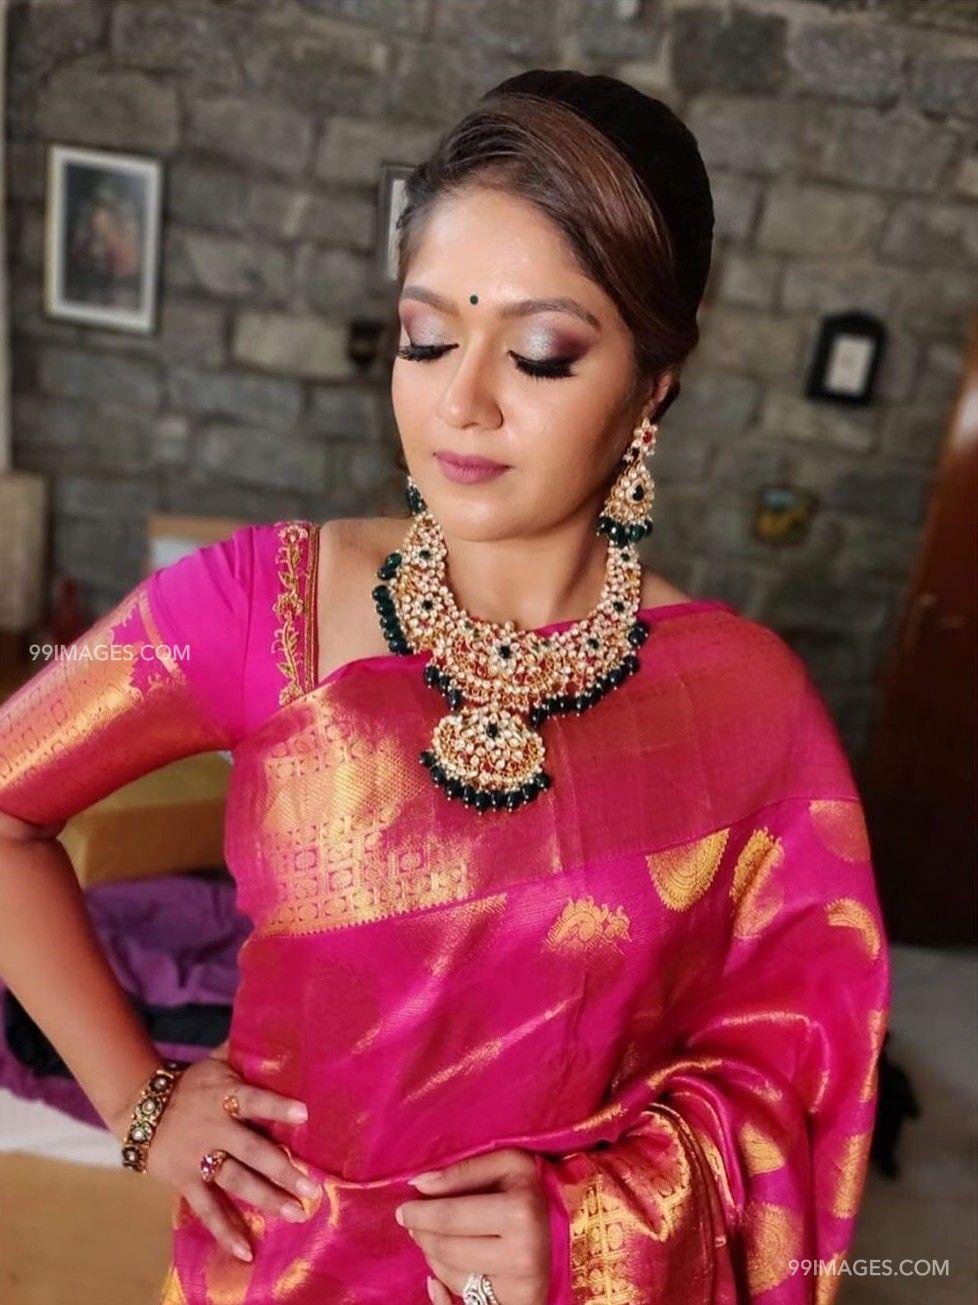 Meghana Raj Beautiful Hd Photos Mobile Wallpapers Hd Android Iphone 1080p Meghana Raj Actress Koll Hd Wallpapers For Mobile Mobile Wallpaper Hd Photos